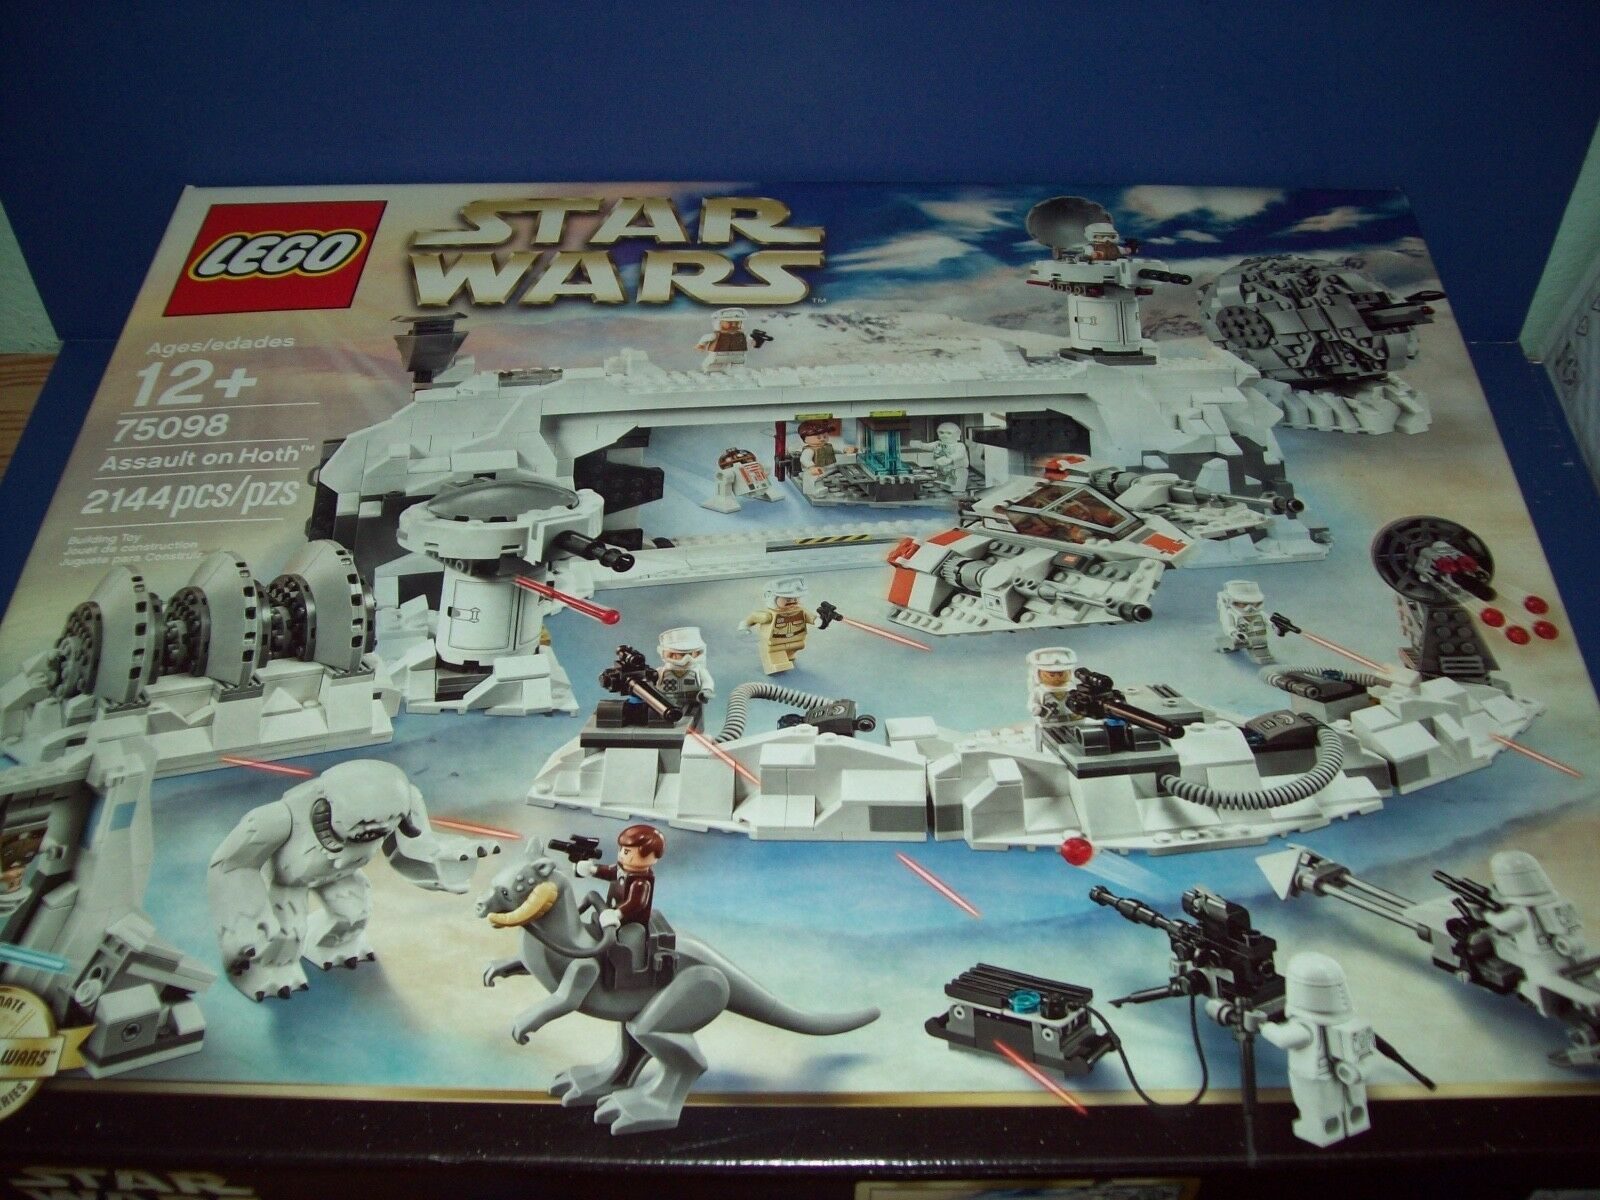 LEGO 75098 estrella guerras UCS  ASSAULT ON calienteH NISB nuovo Exclusive  varie dimensioni